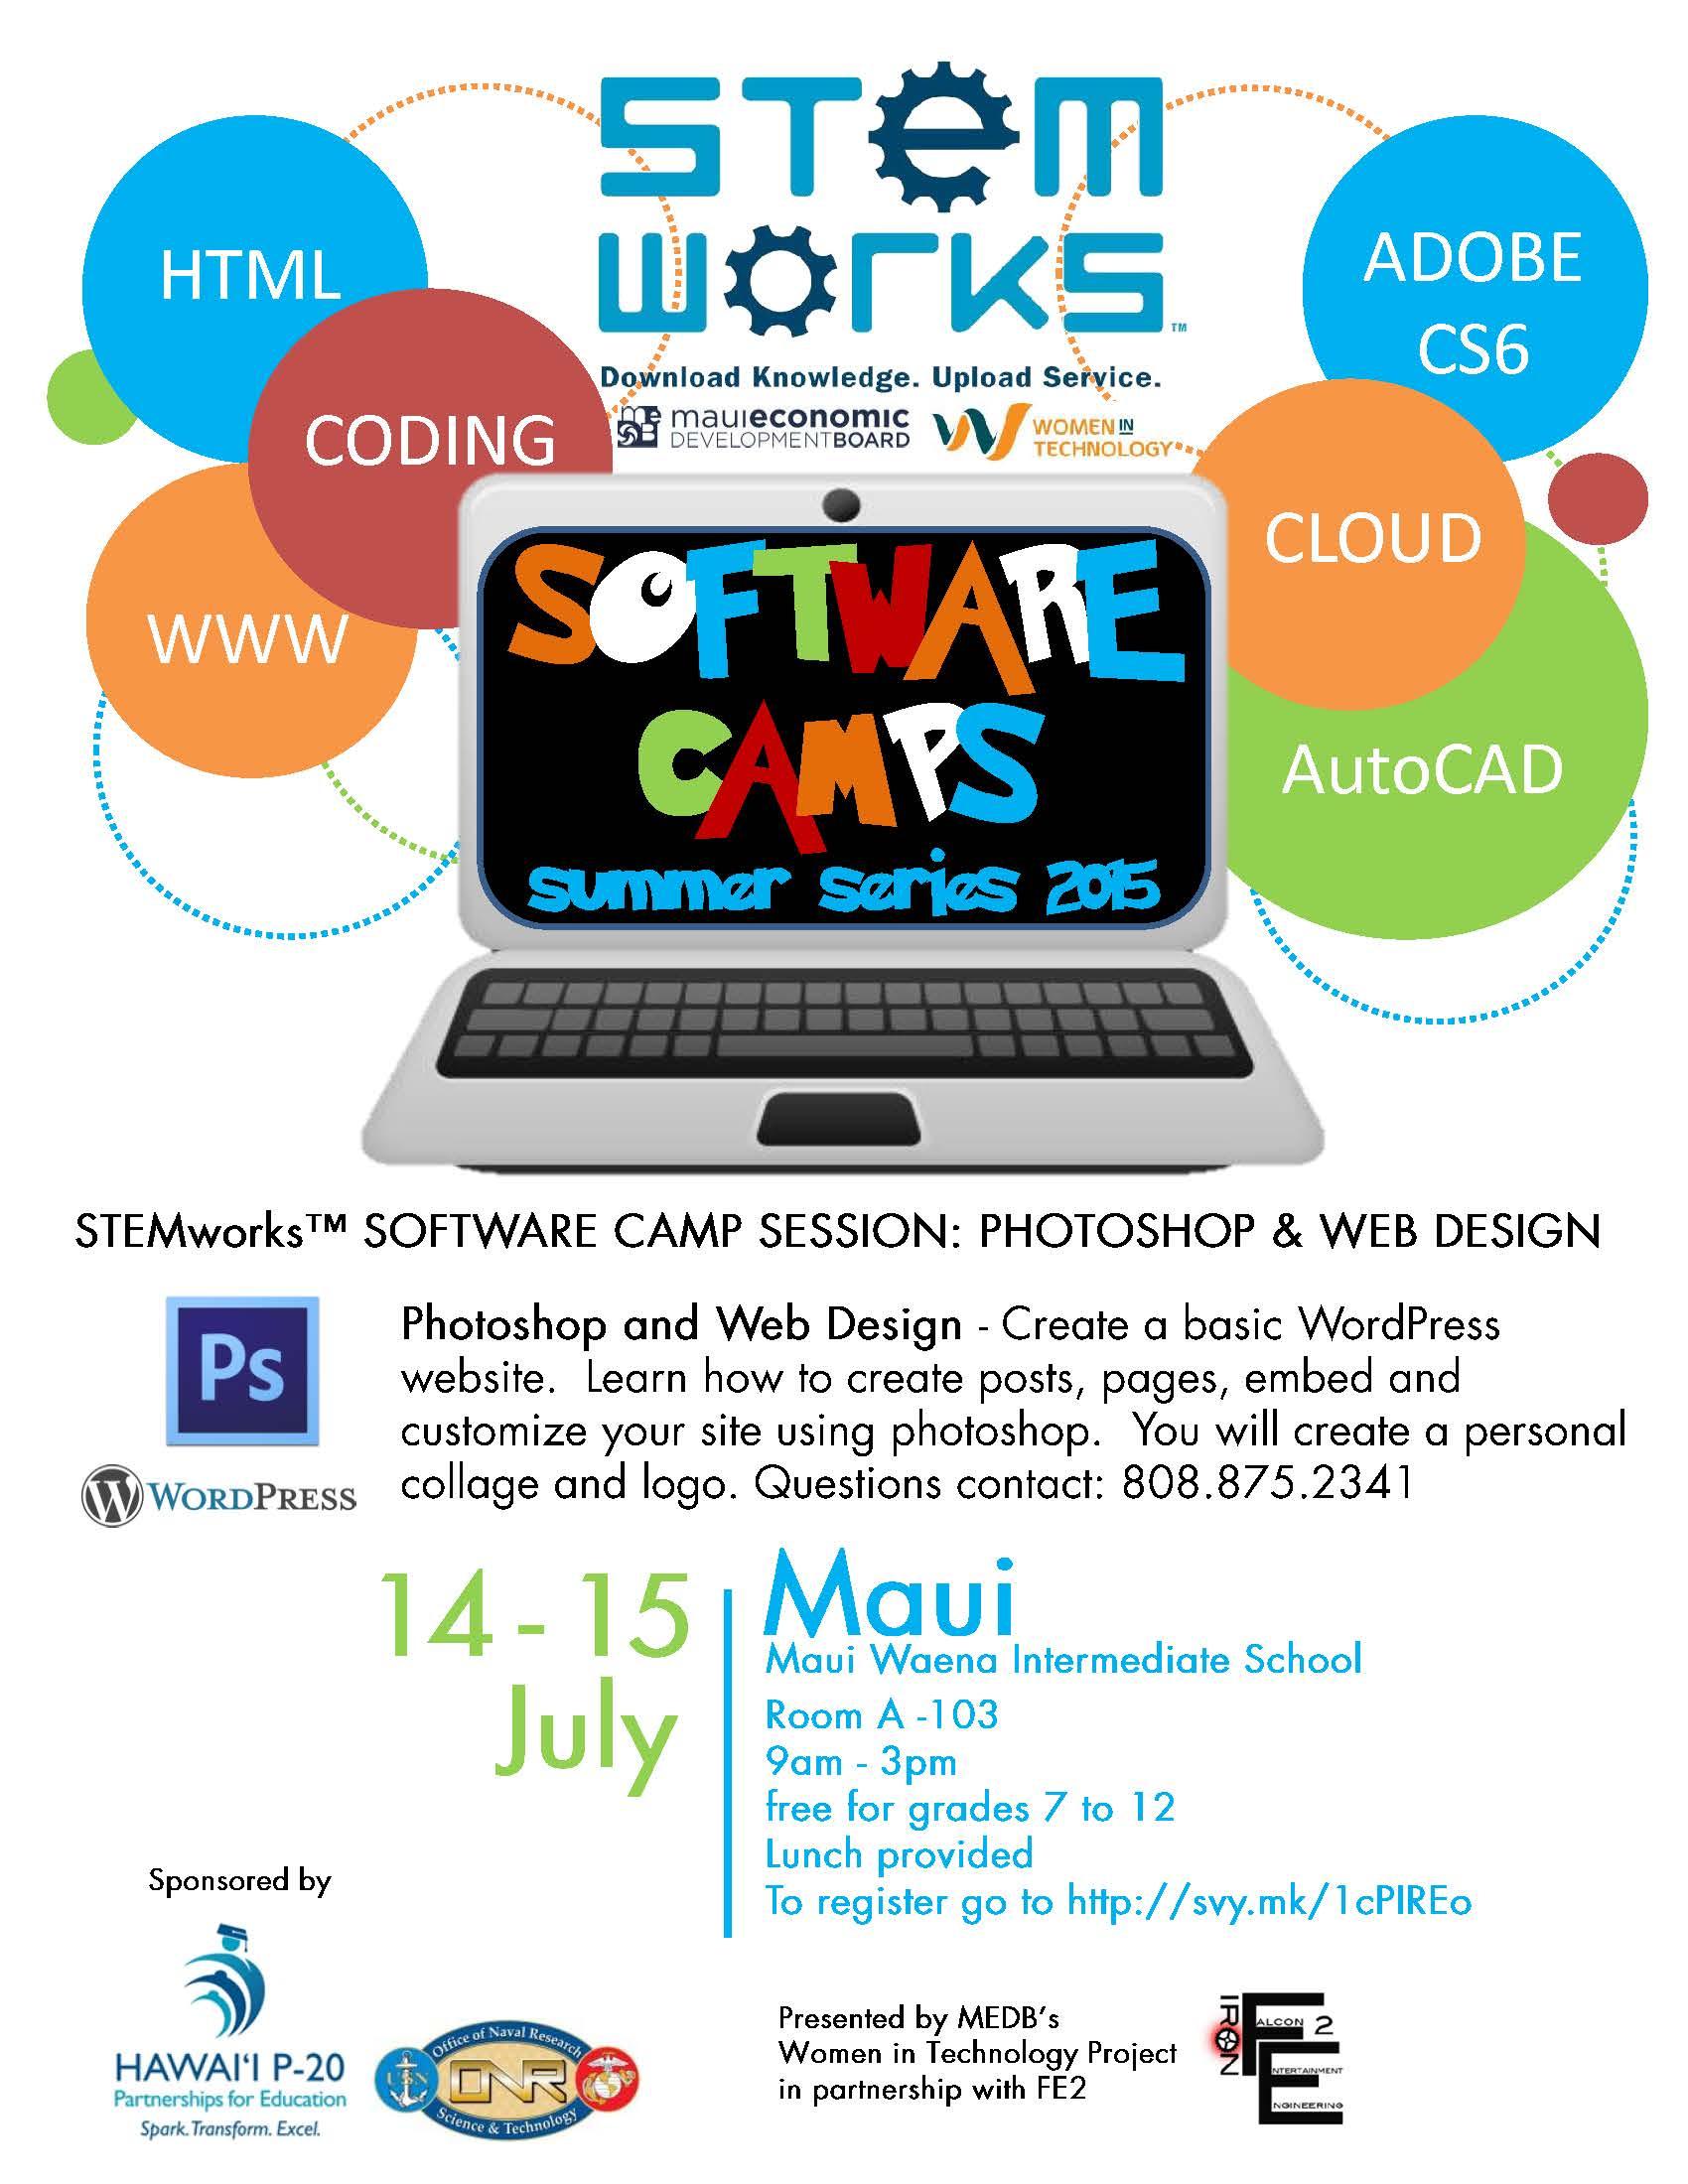 FLYER_MAUISoftwareCamp_summerphotoshopweb_2015.jpg